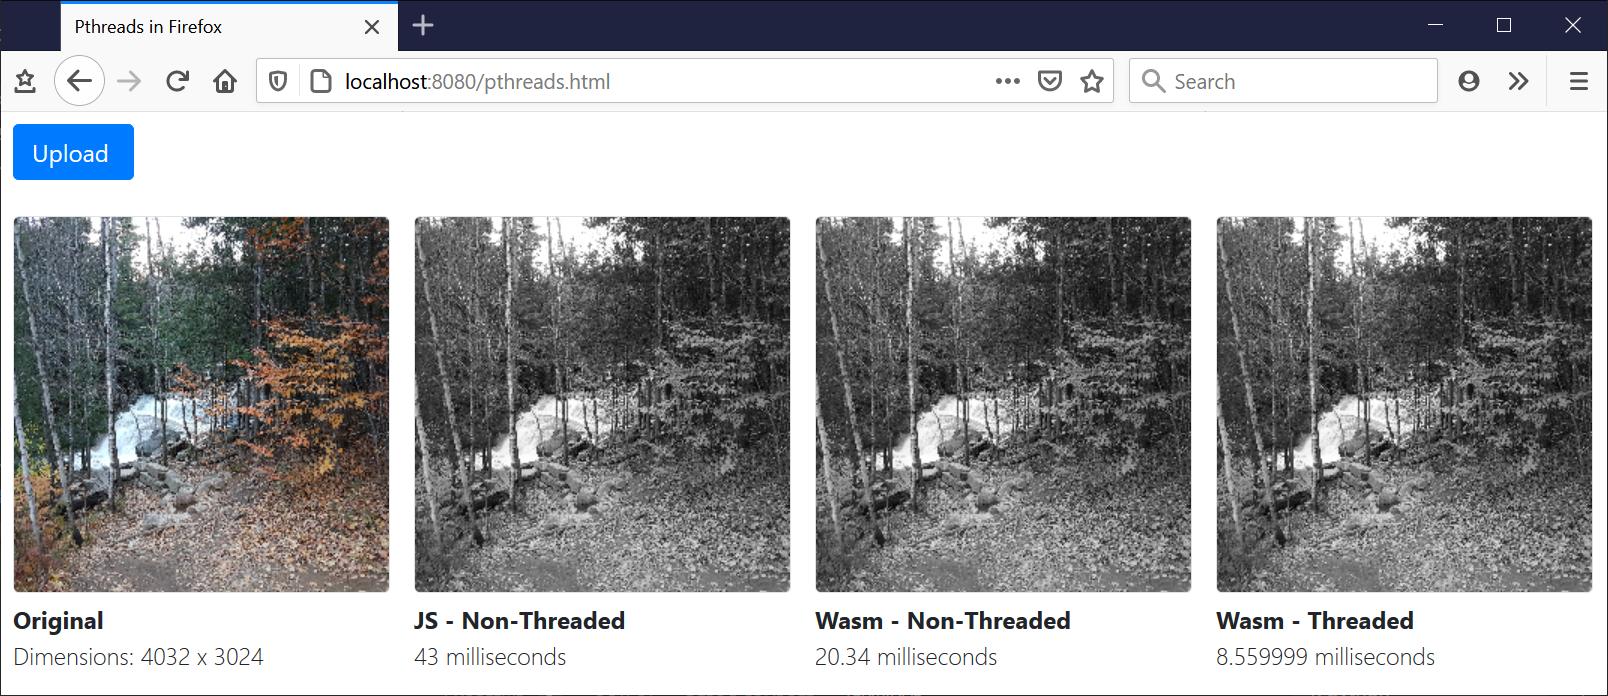 uploading image and measuring performance